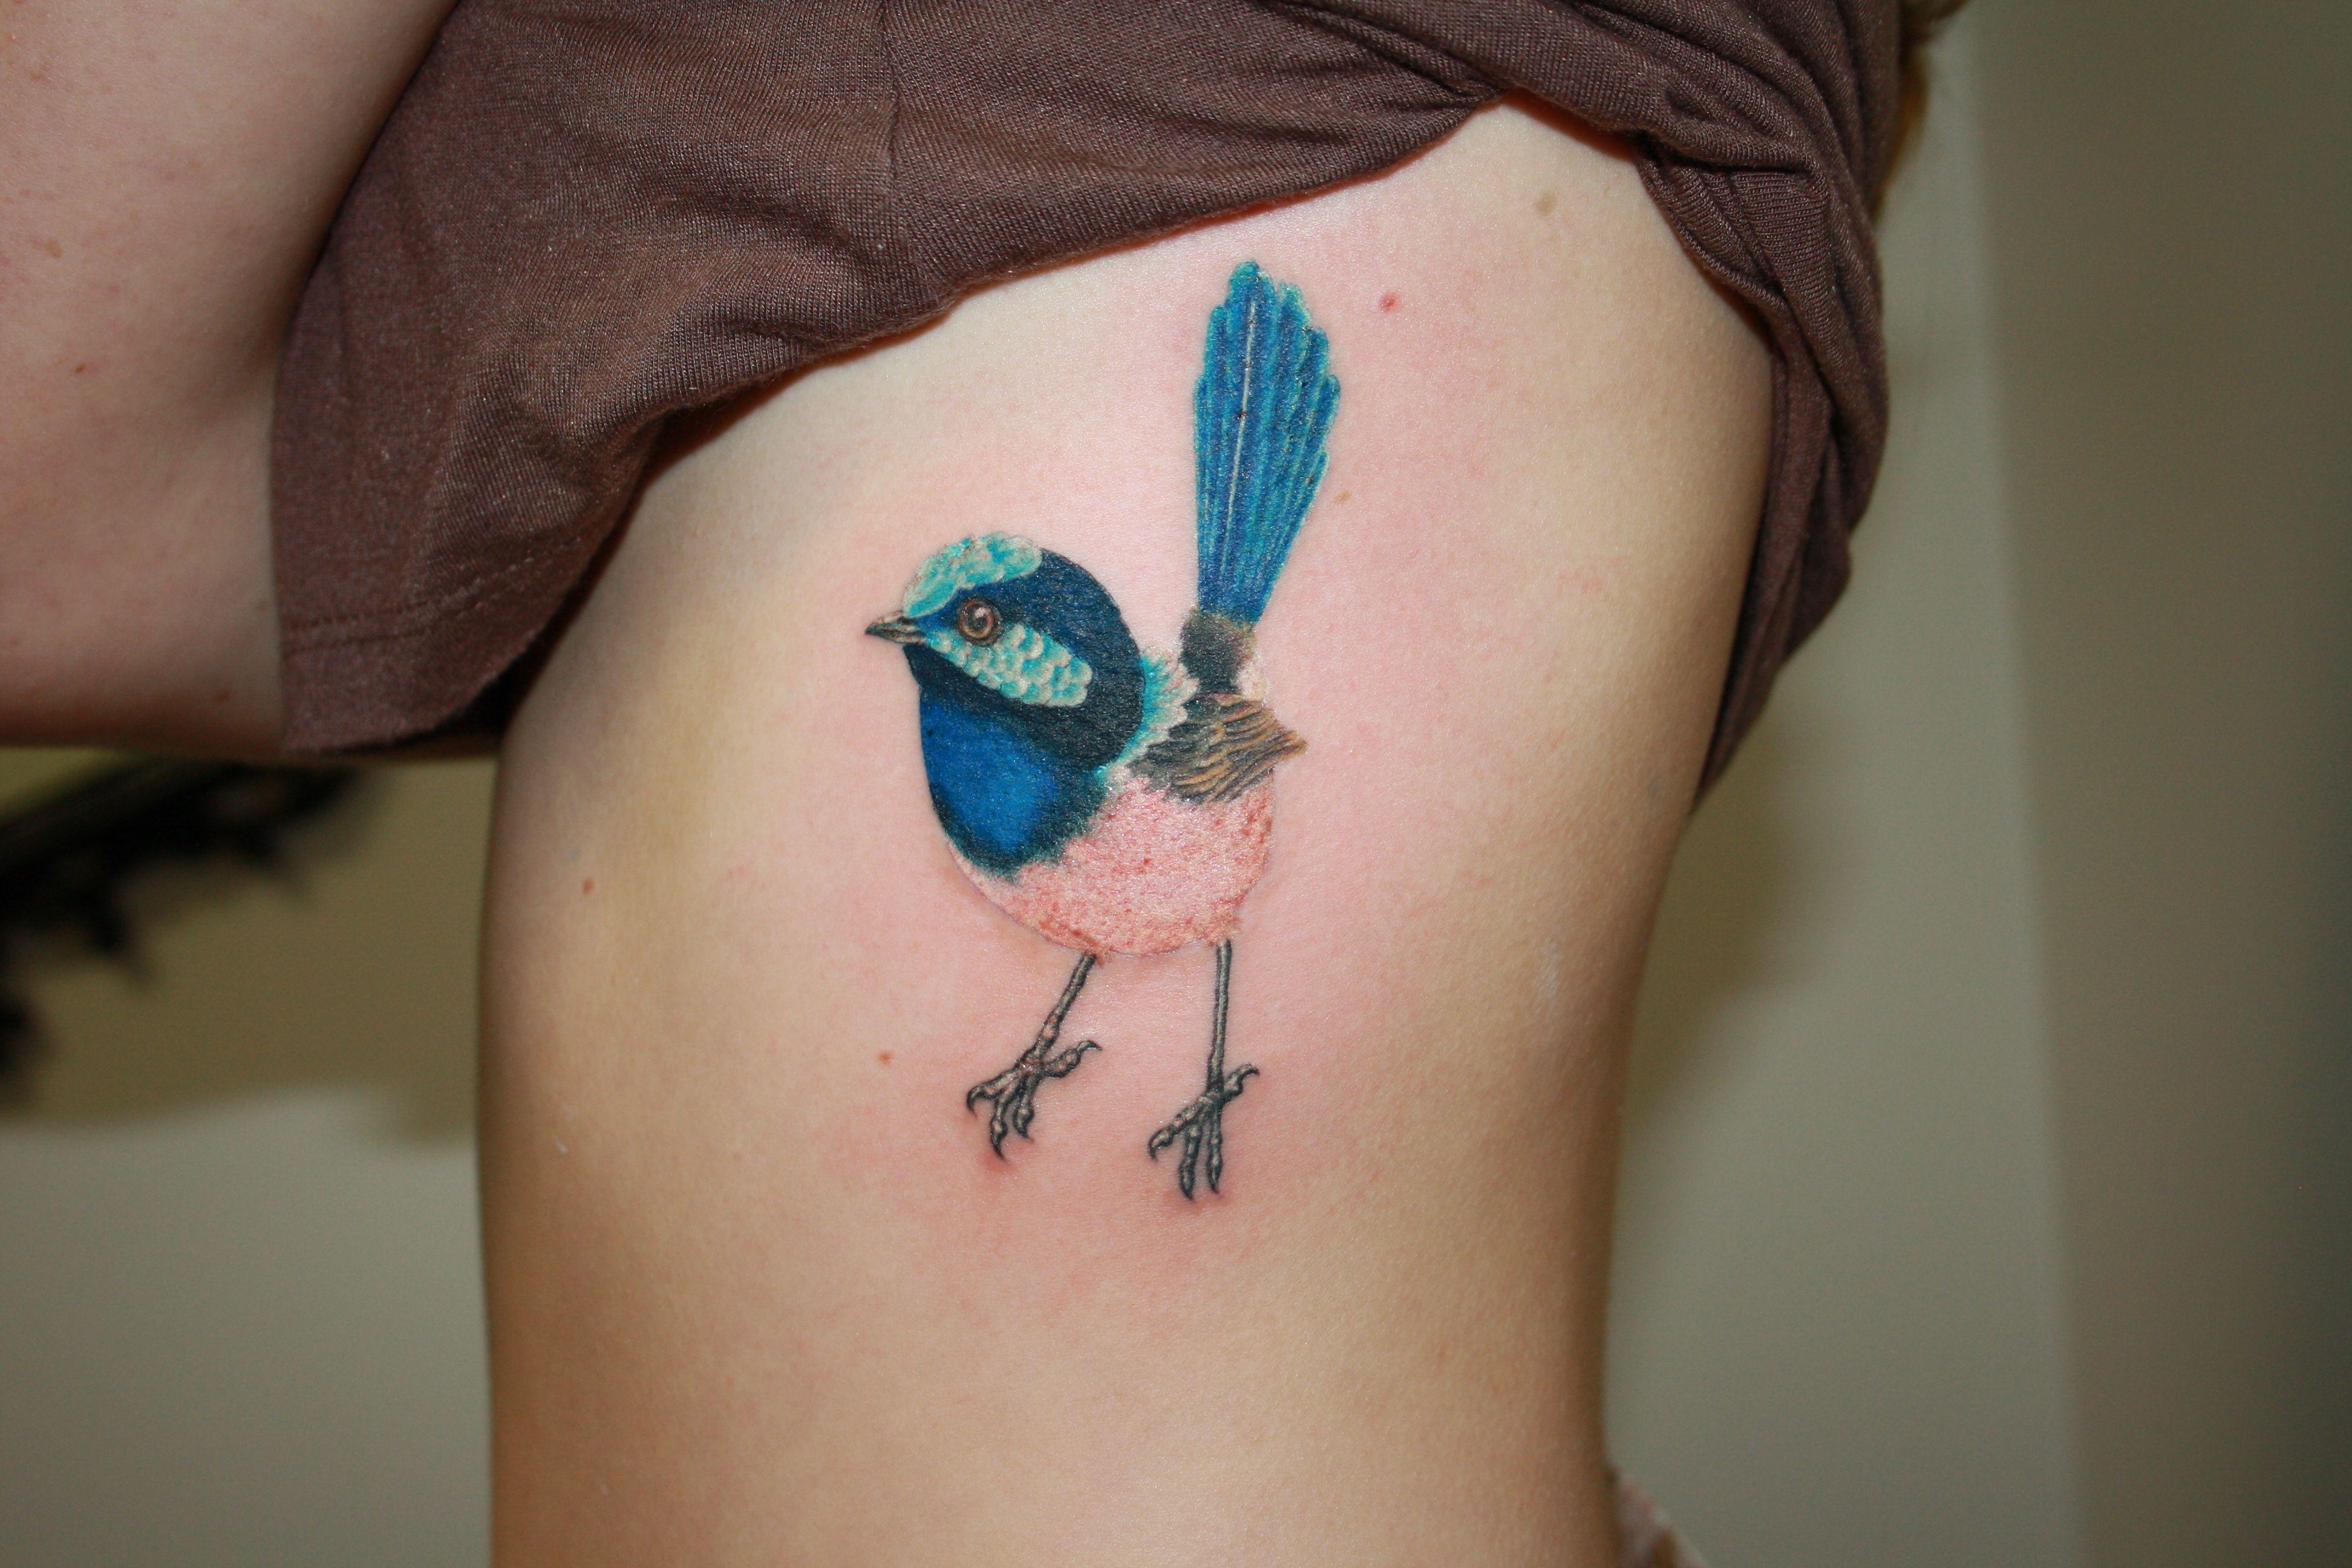 Blue birds tattoo - photo#4